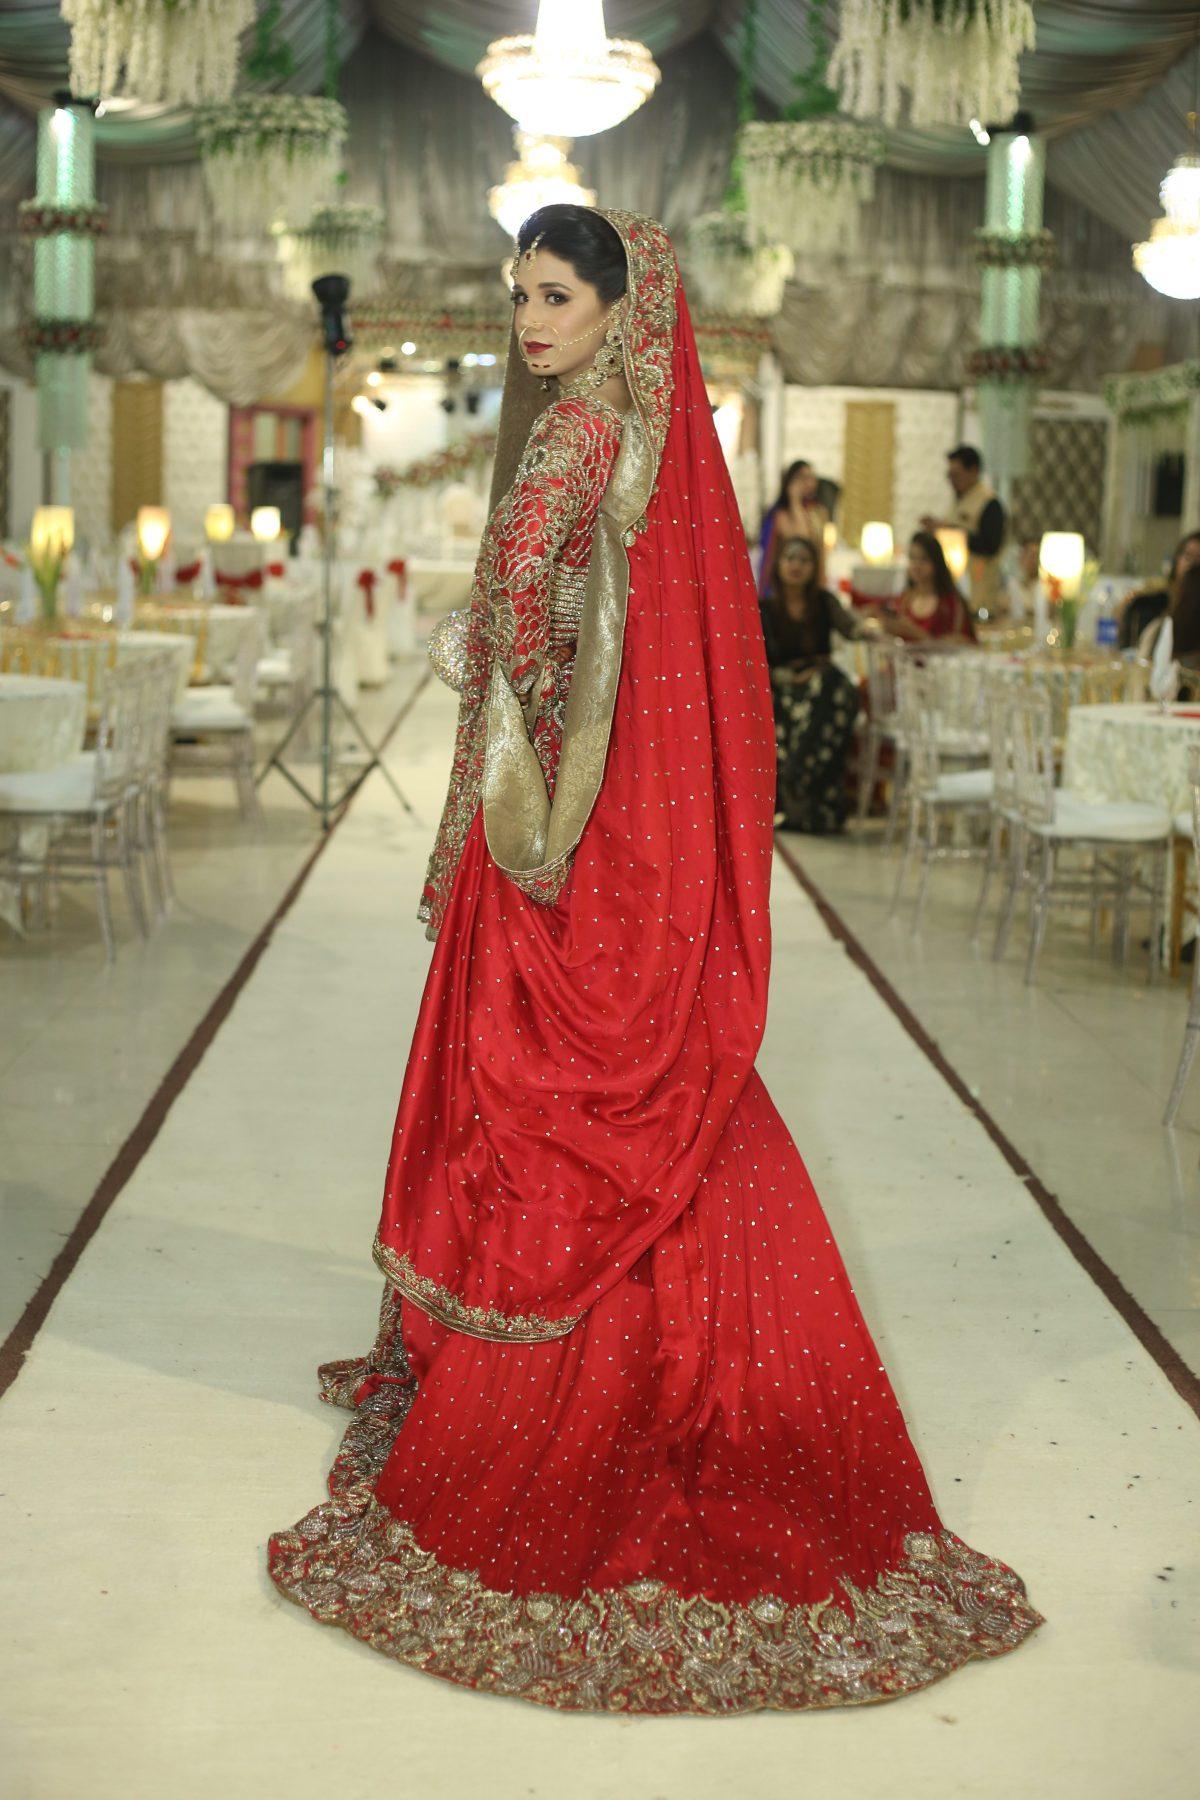 Imran Ashraf Shared his Awesome Wedding Photos on his Anniversary